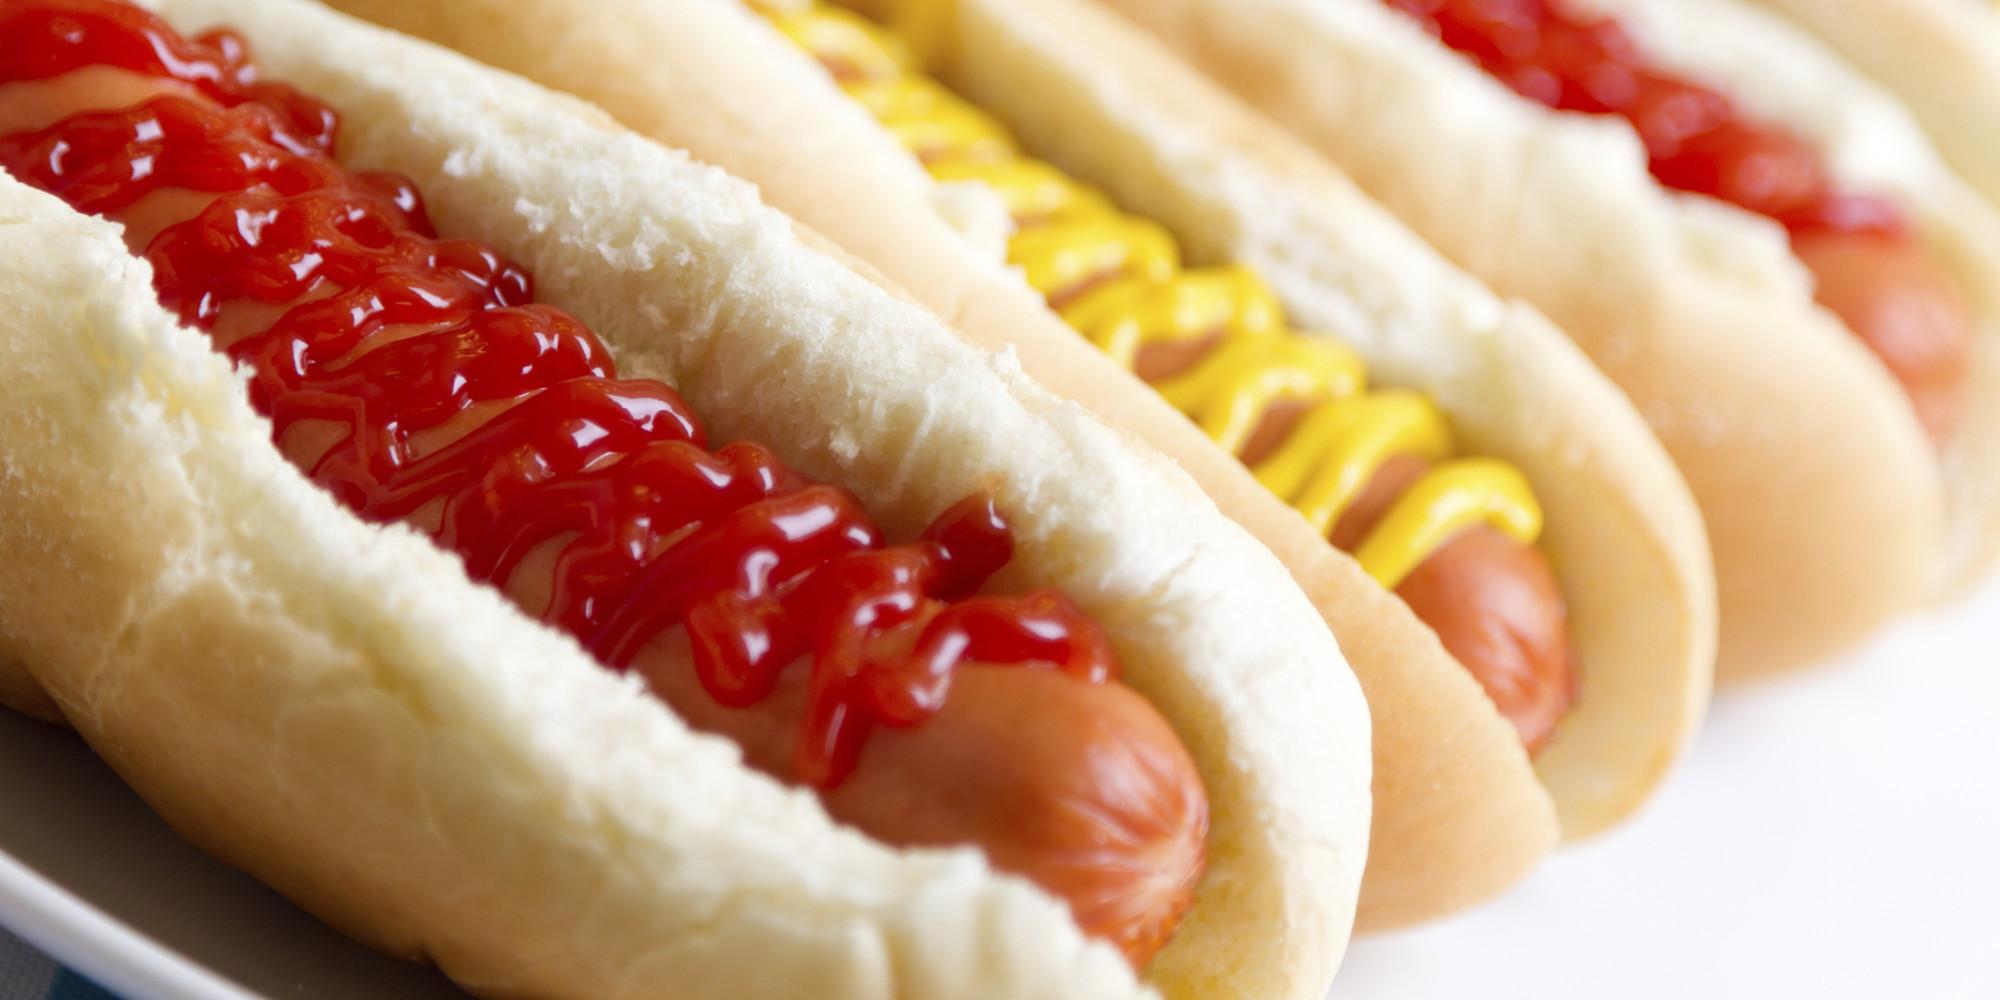 hot dog stellung bauchnabelpircings